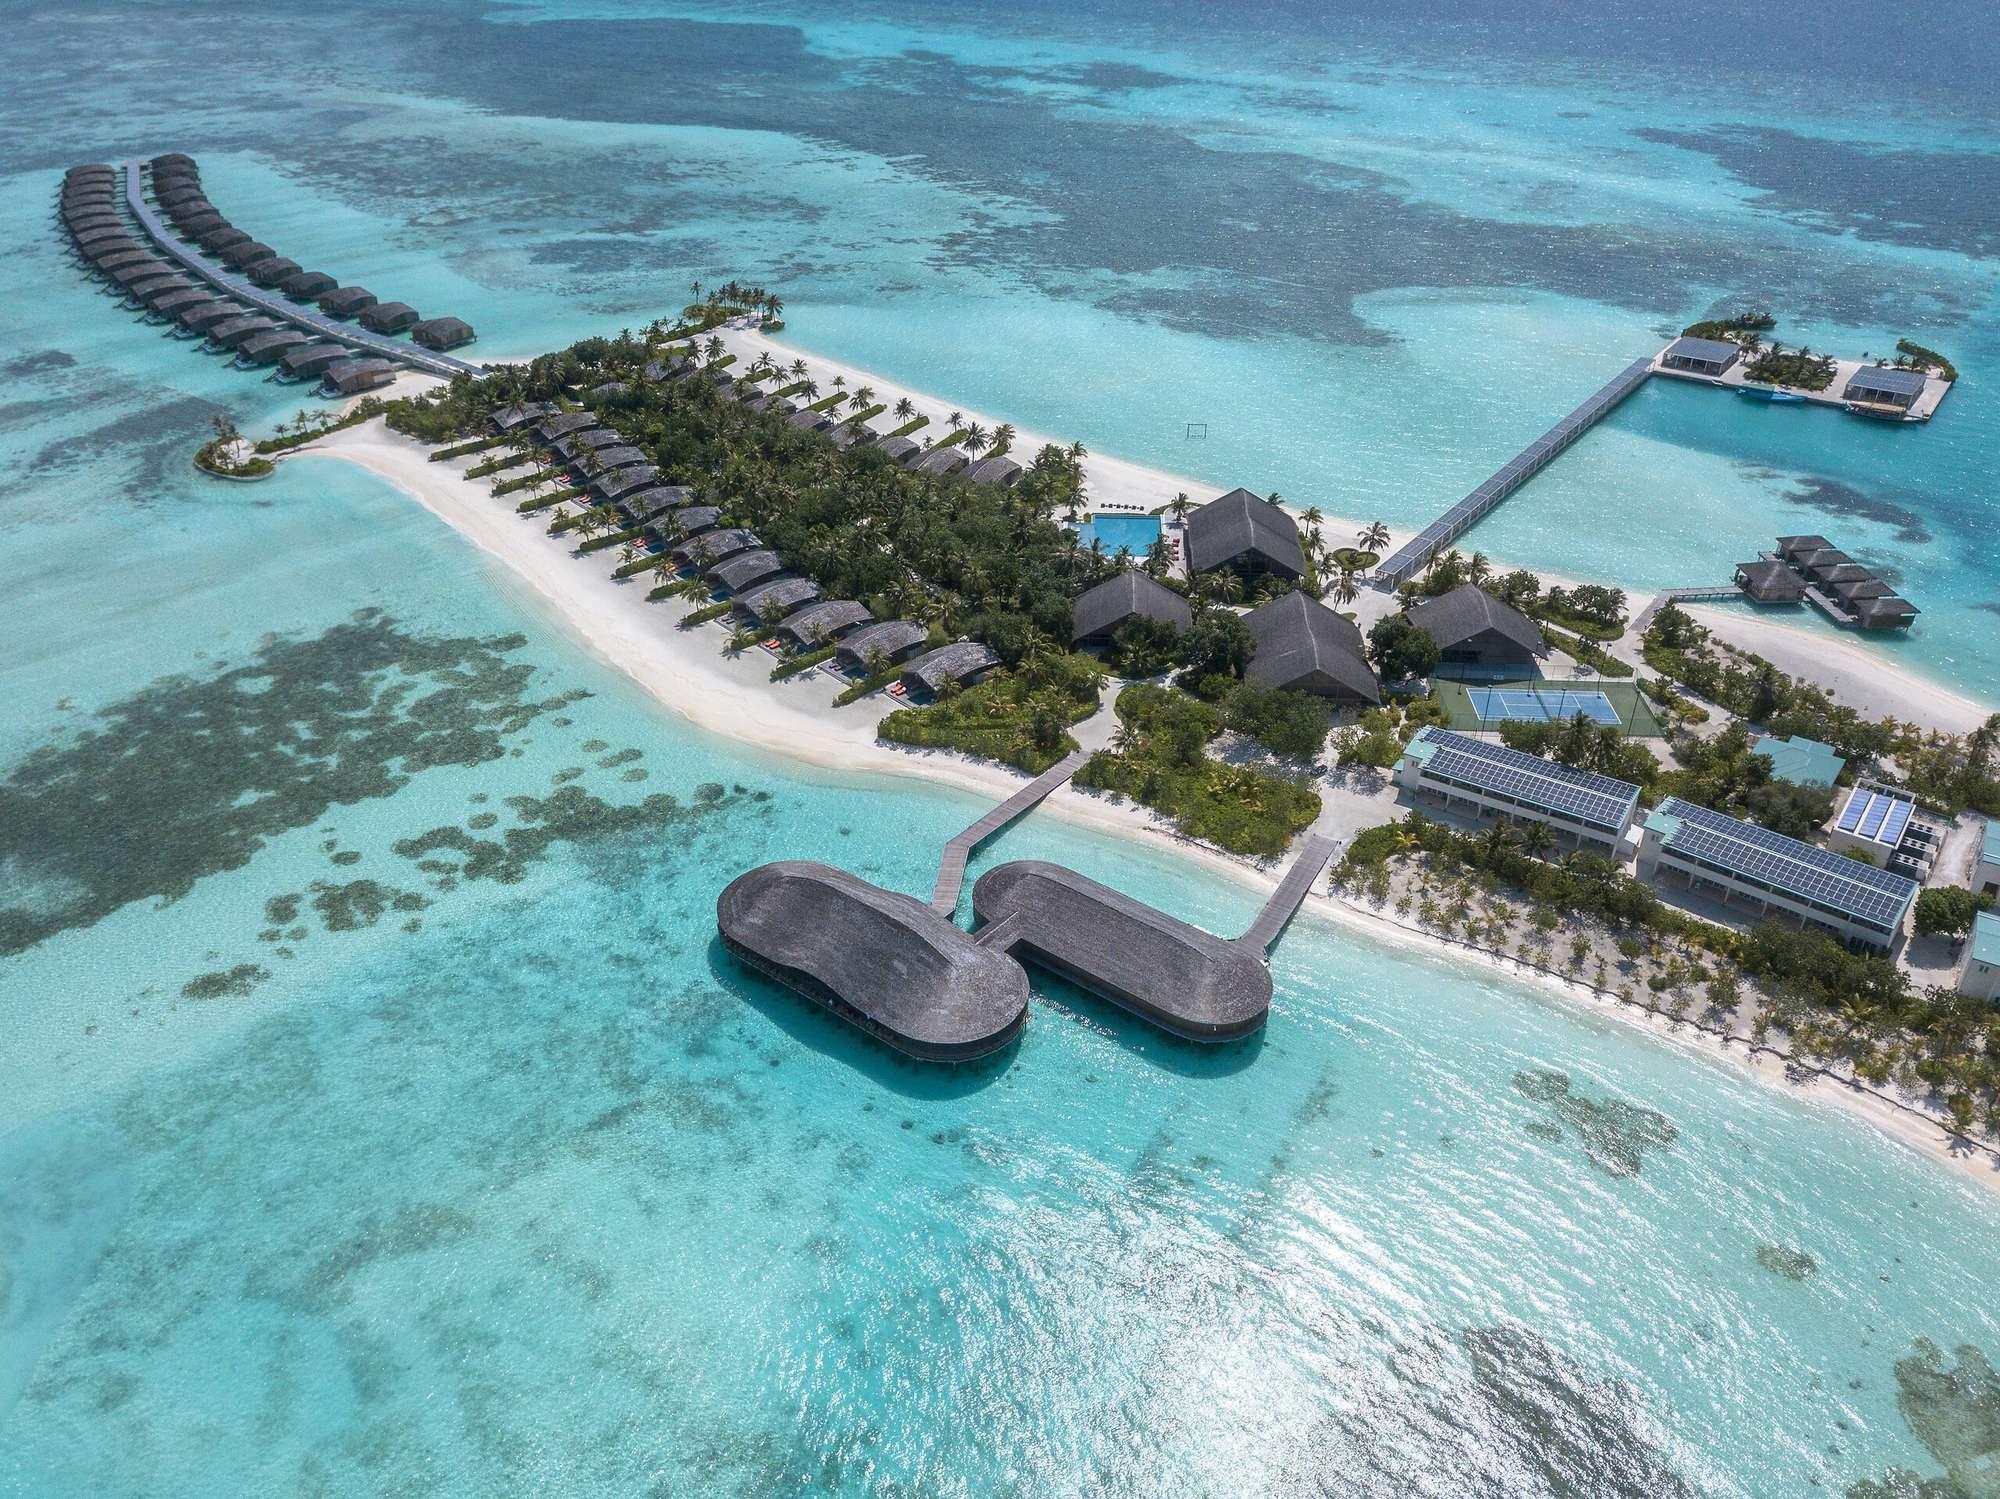 ClubMed Finolhu Villas Maldives (คลับเมด ฟิโนลูห์ วิลล่า มัลดีฟส์) ไม่รวมตั๋วเครื่องบิน ราคาเริ่มต้น 47,320 บาท เหมาะสำหรับคู่รัก